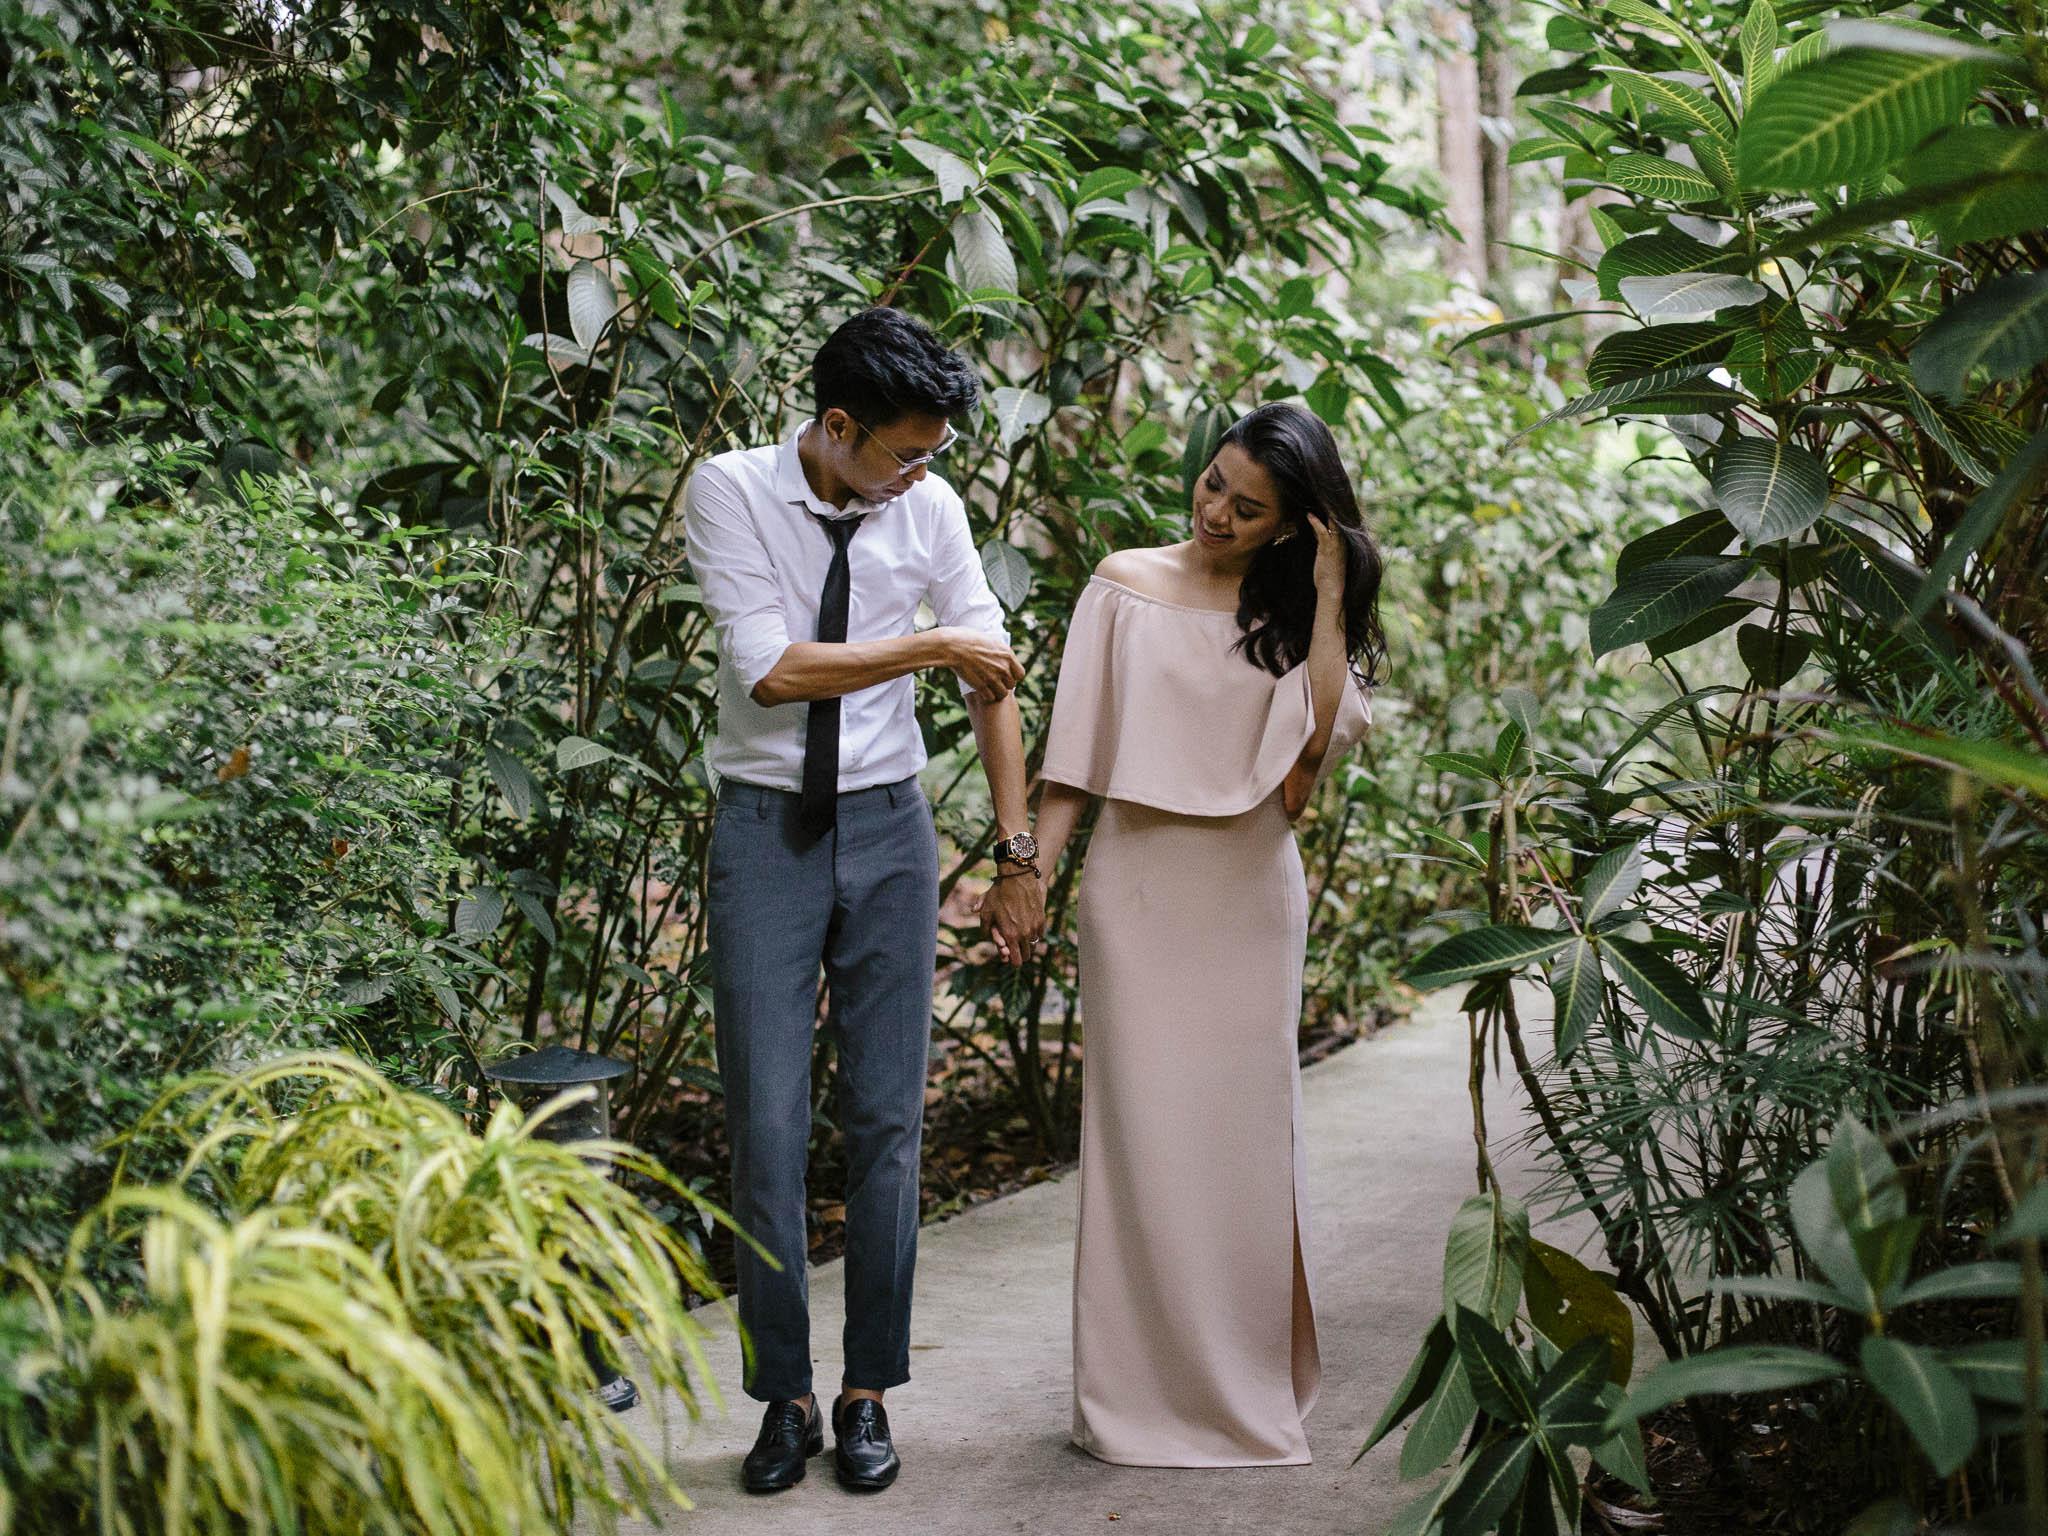 singapore-wedding-photographer-malay-travel-adli-tashah-39.jpg